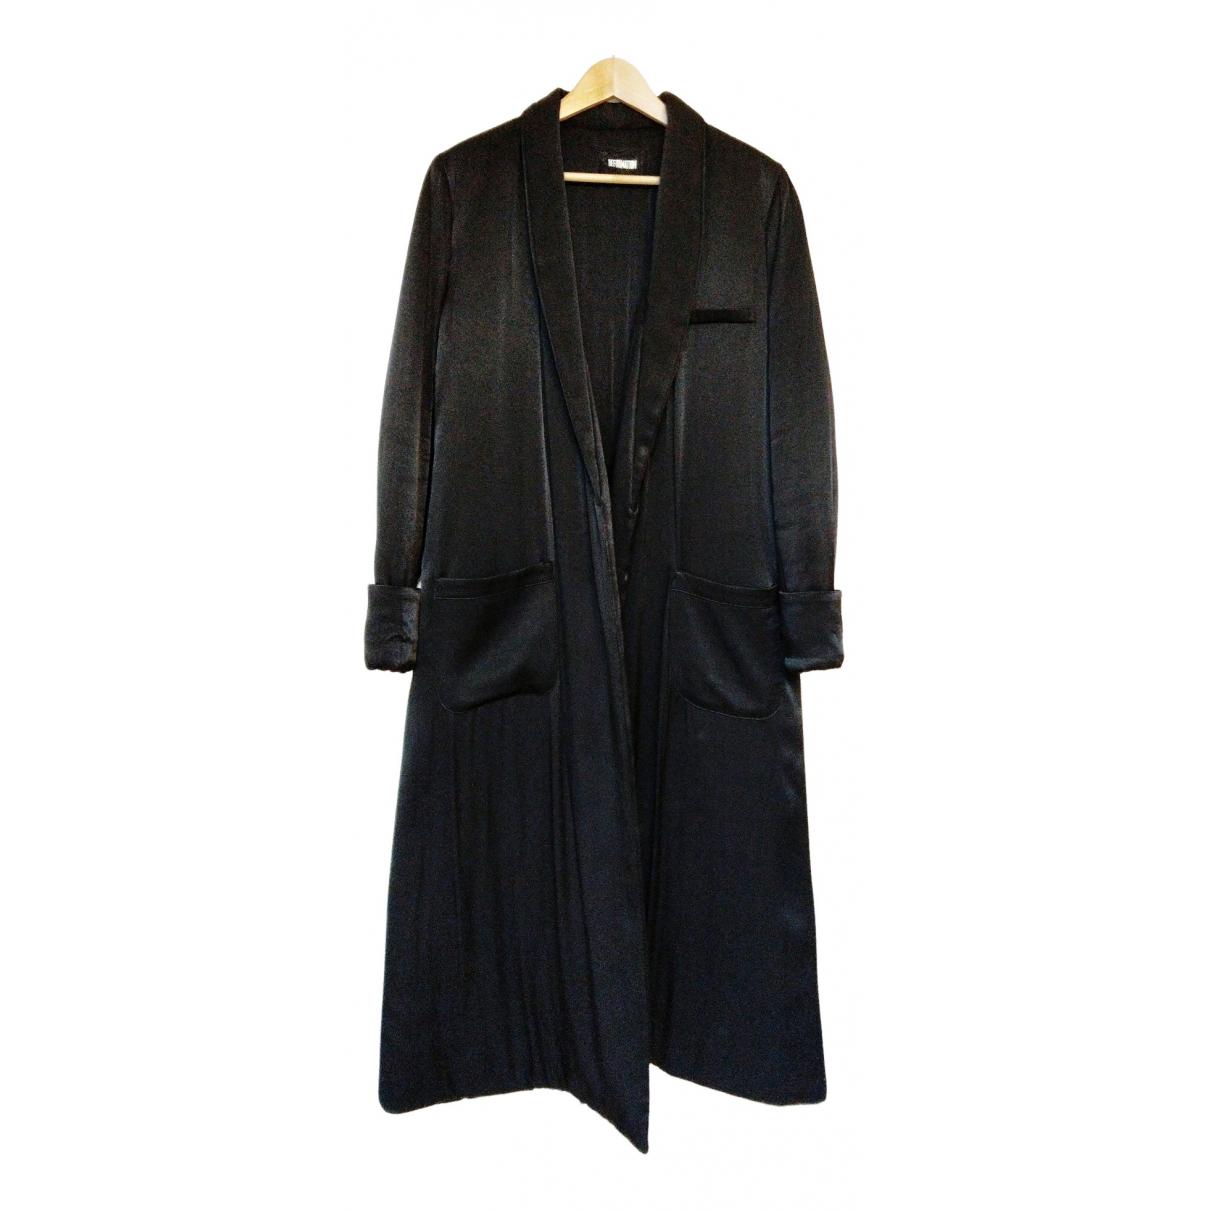 Reformation N Black Wool coat for Women S International